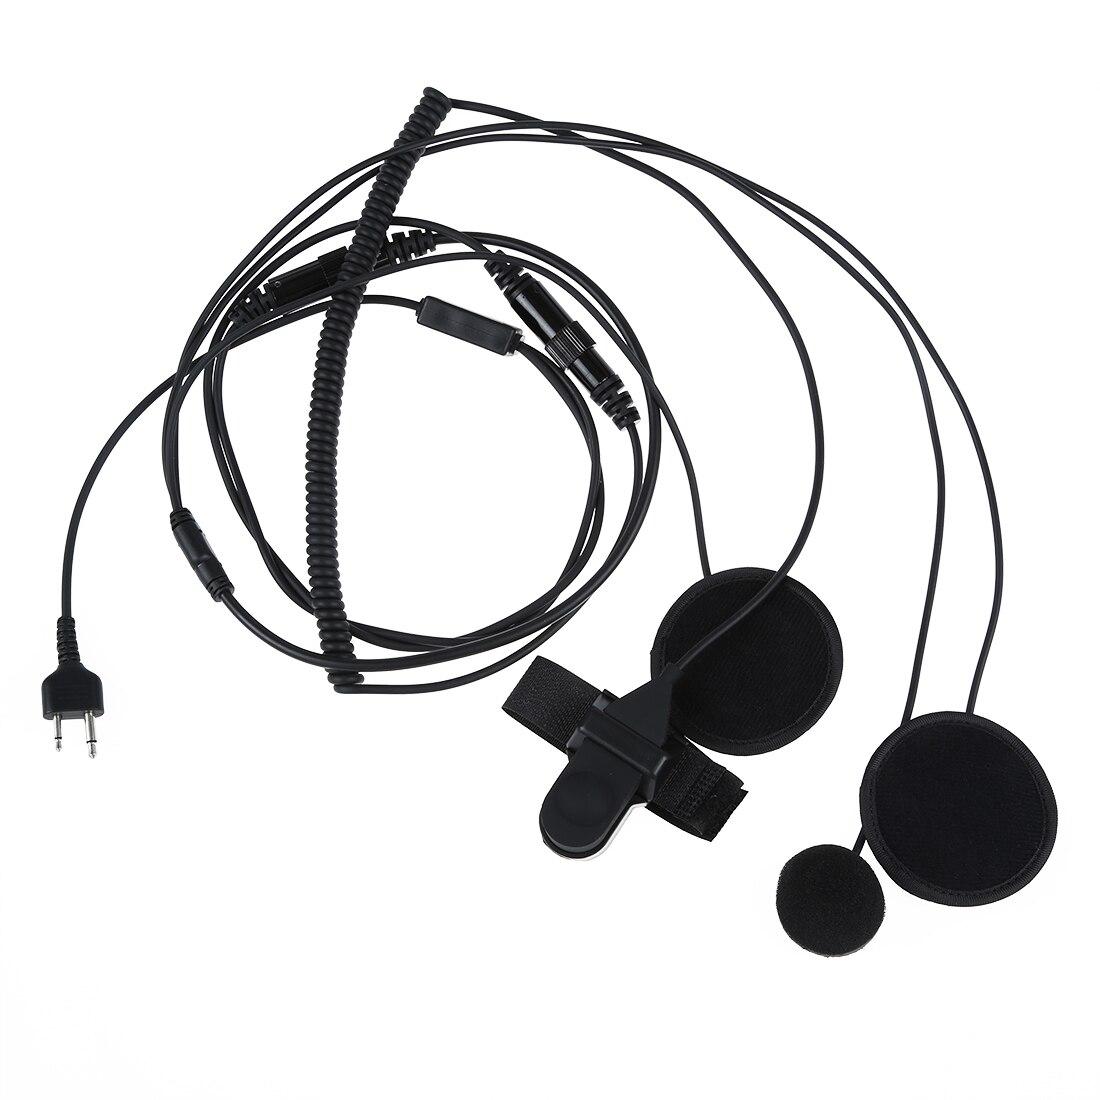 2 pin two-way radios Full-face motorcycle moto bike helmet headset earphone microphone for Icom Maxon Yaesu vertex 1000m motorcycle helmet intercom bt s2 waterproof for wired wireless helmet